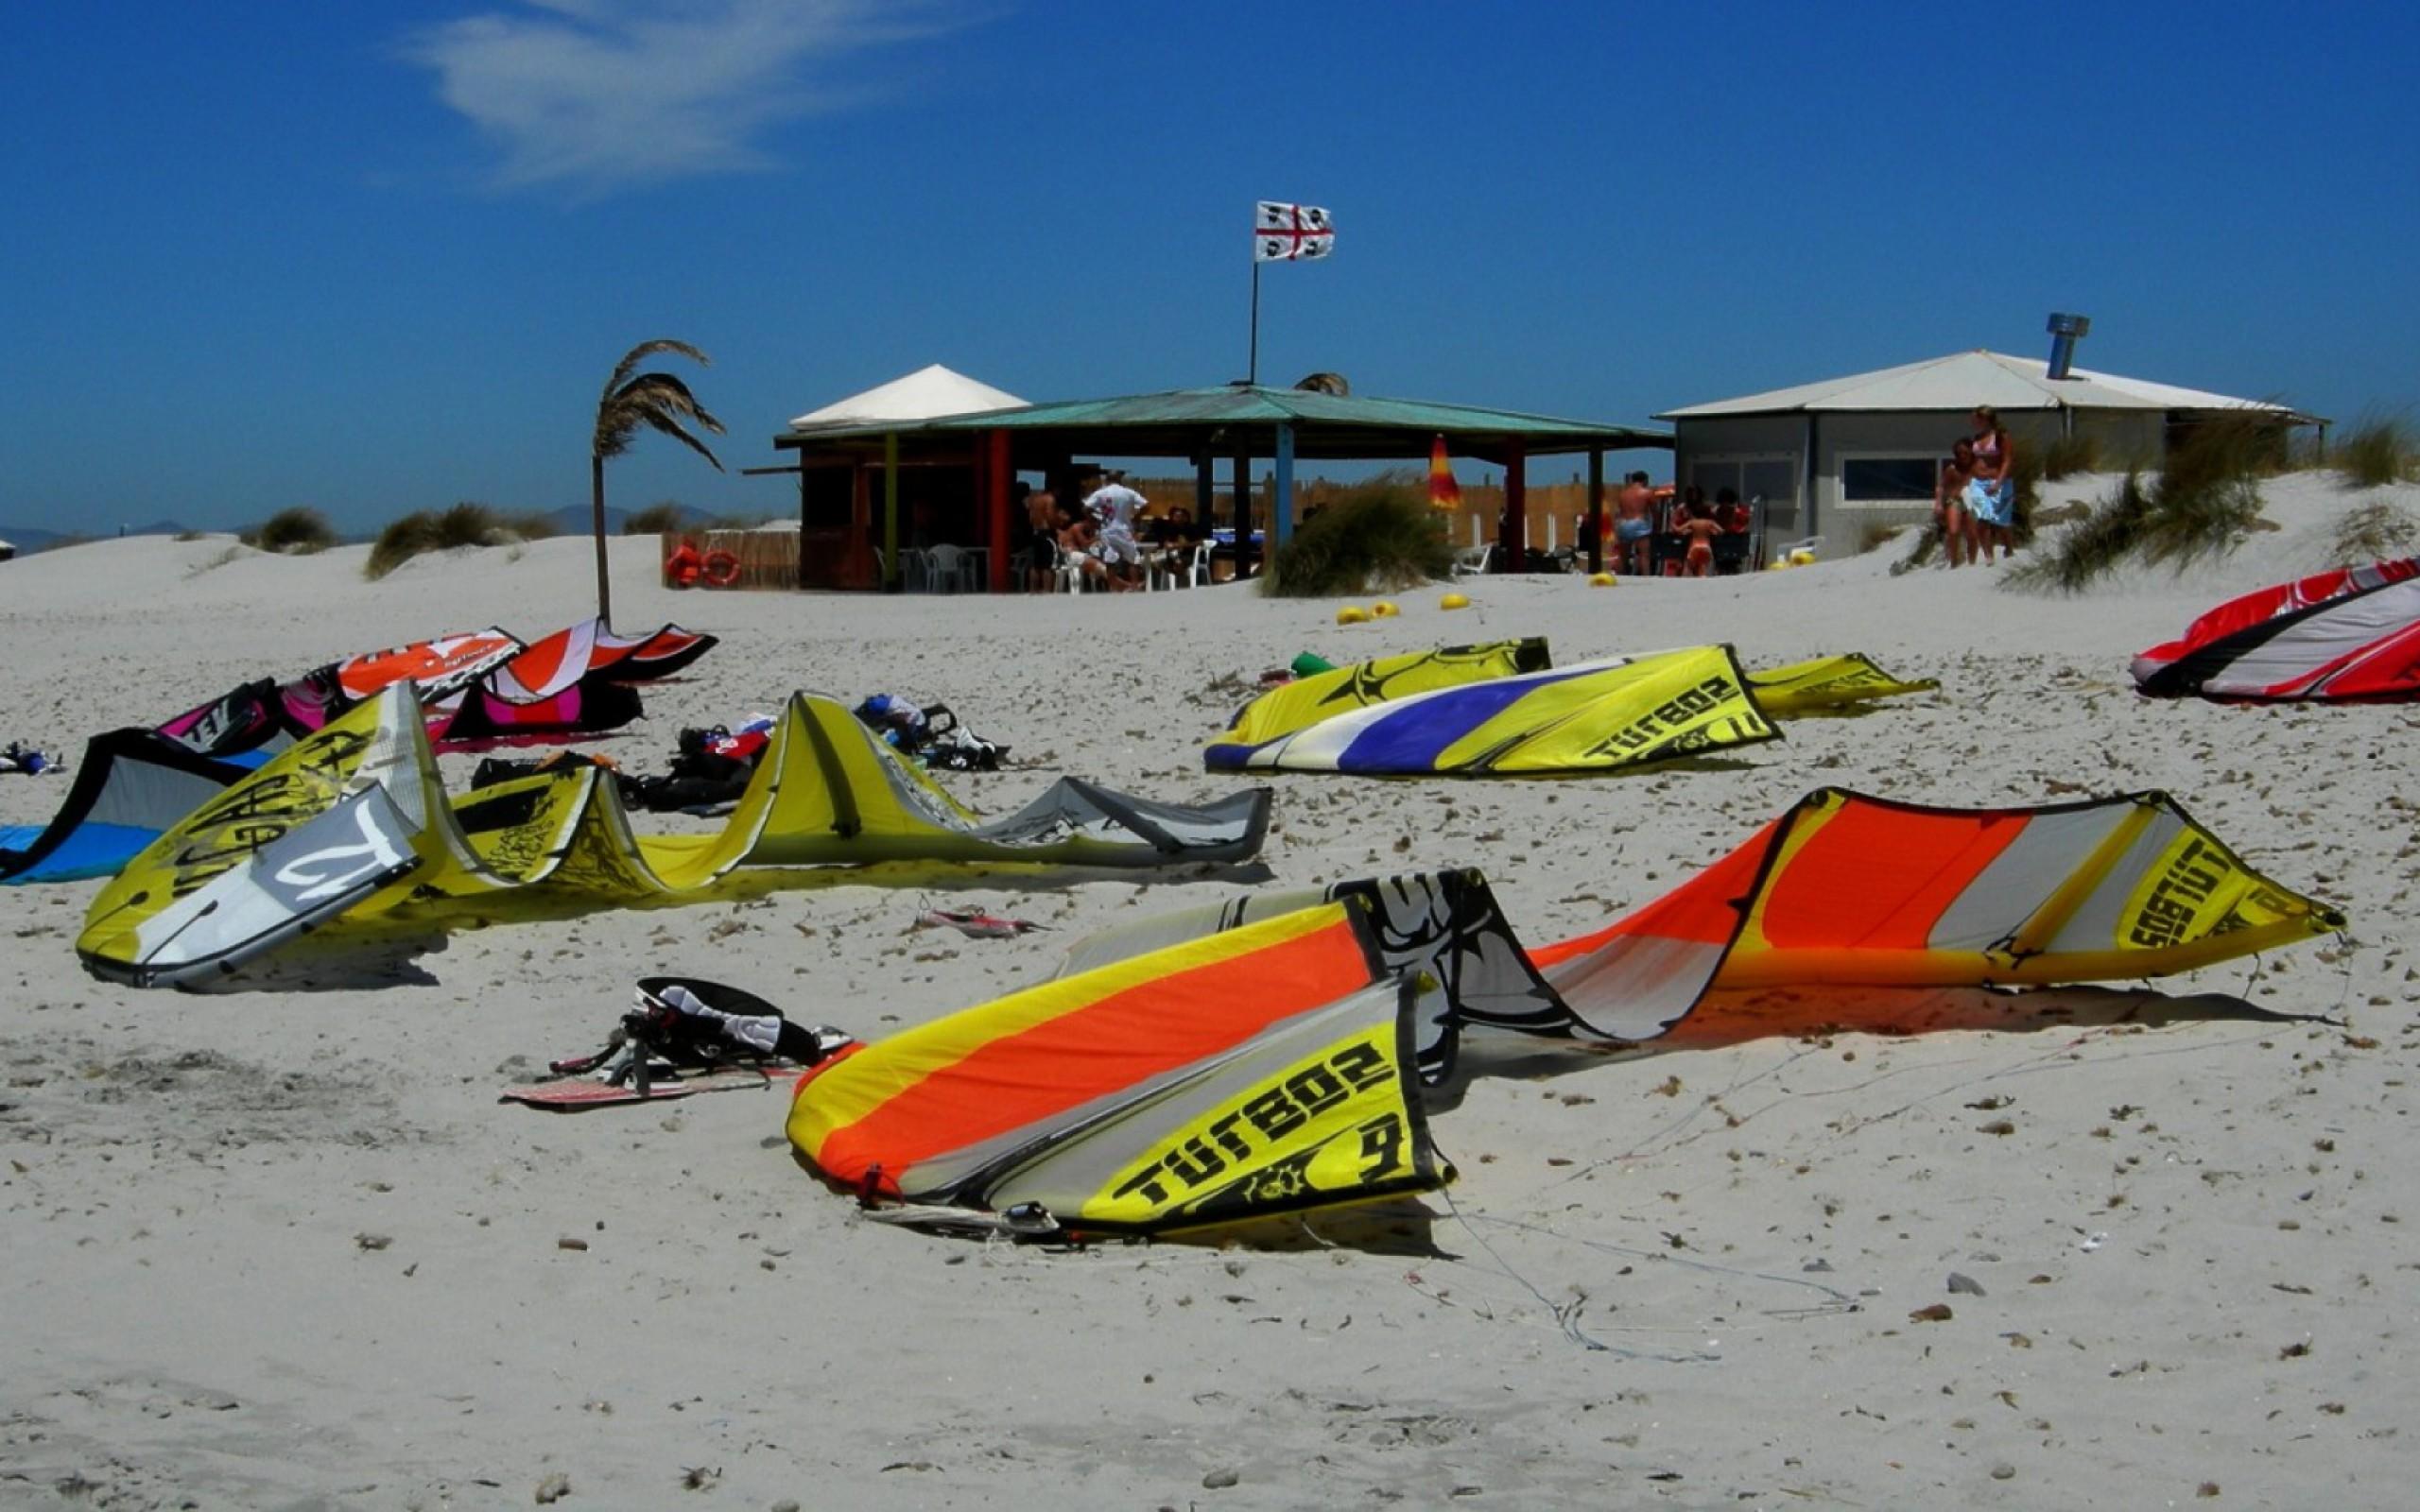 Sardinia Kites On Beach Hd Wallpaper 13 Retina Macbook Pro